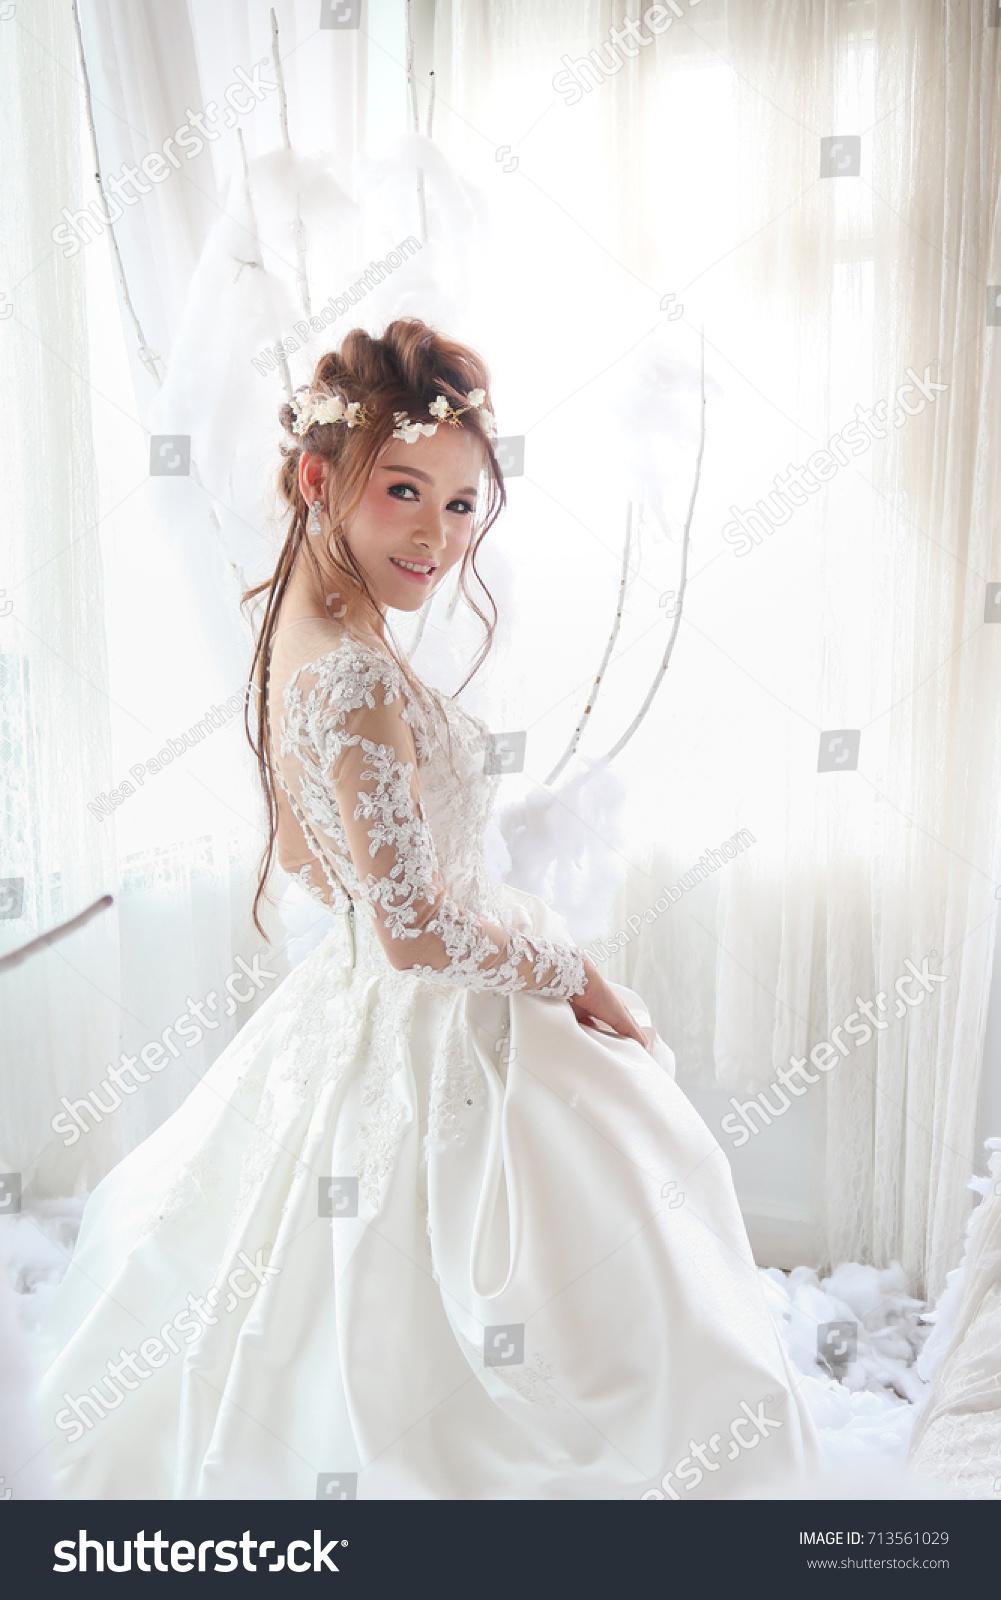 Beautiful Asian Woman White Bride Dress Stock Photo (Royalty Free ...